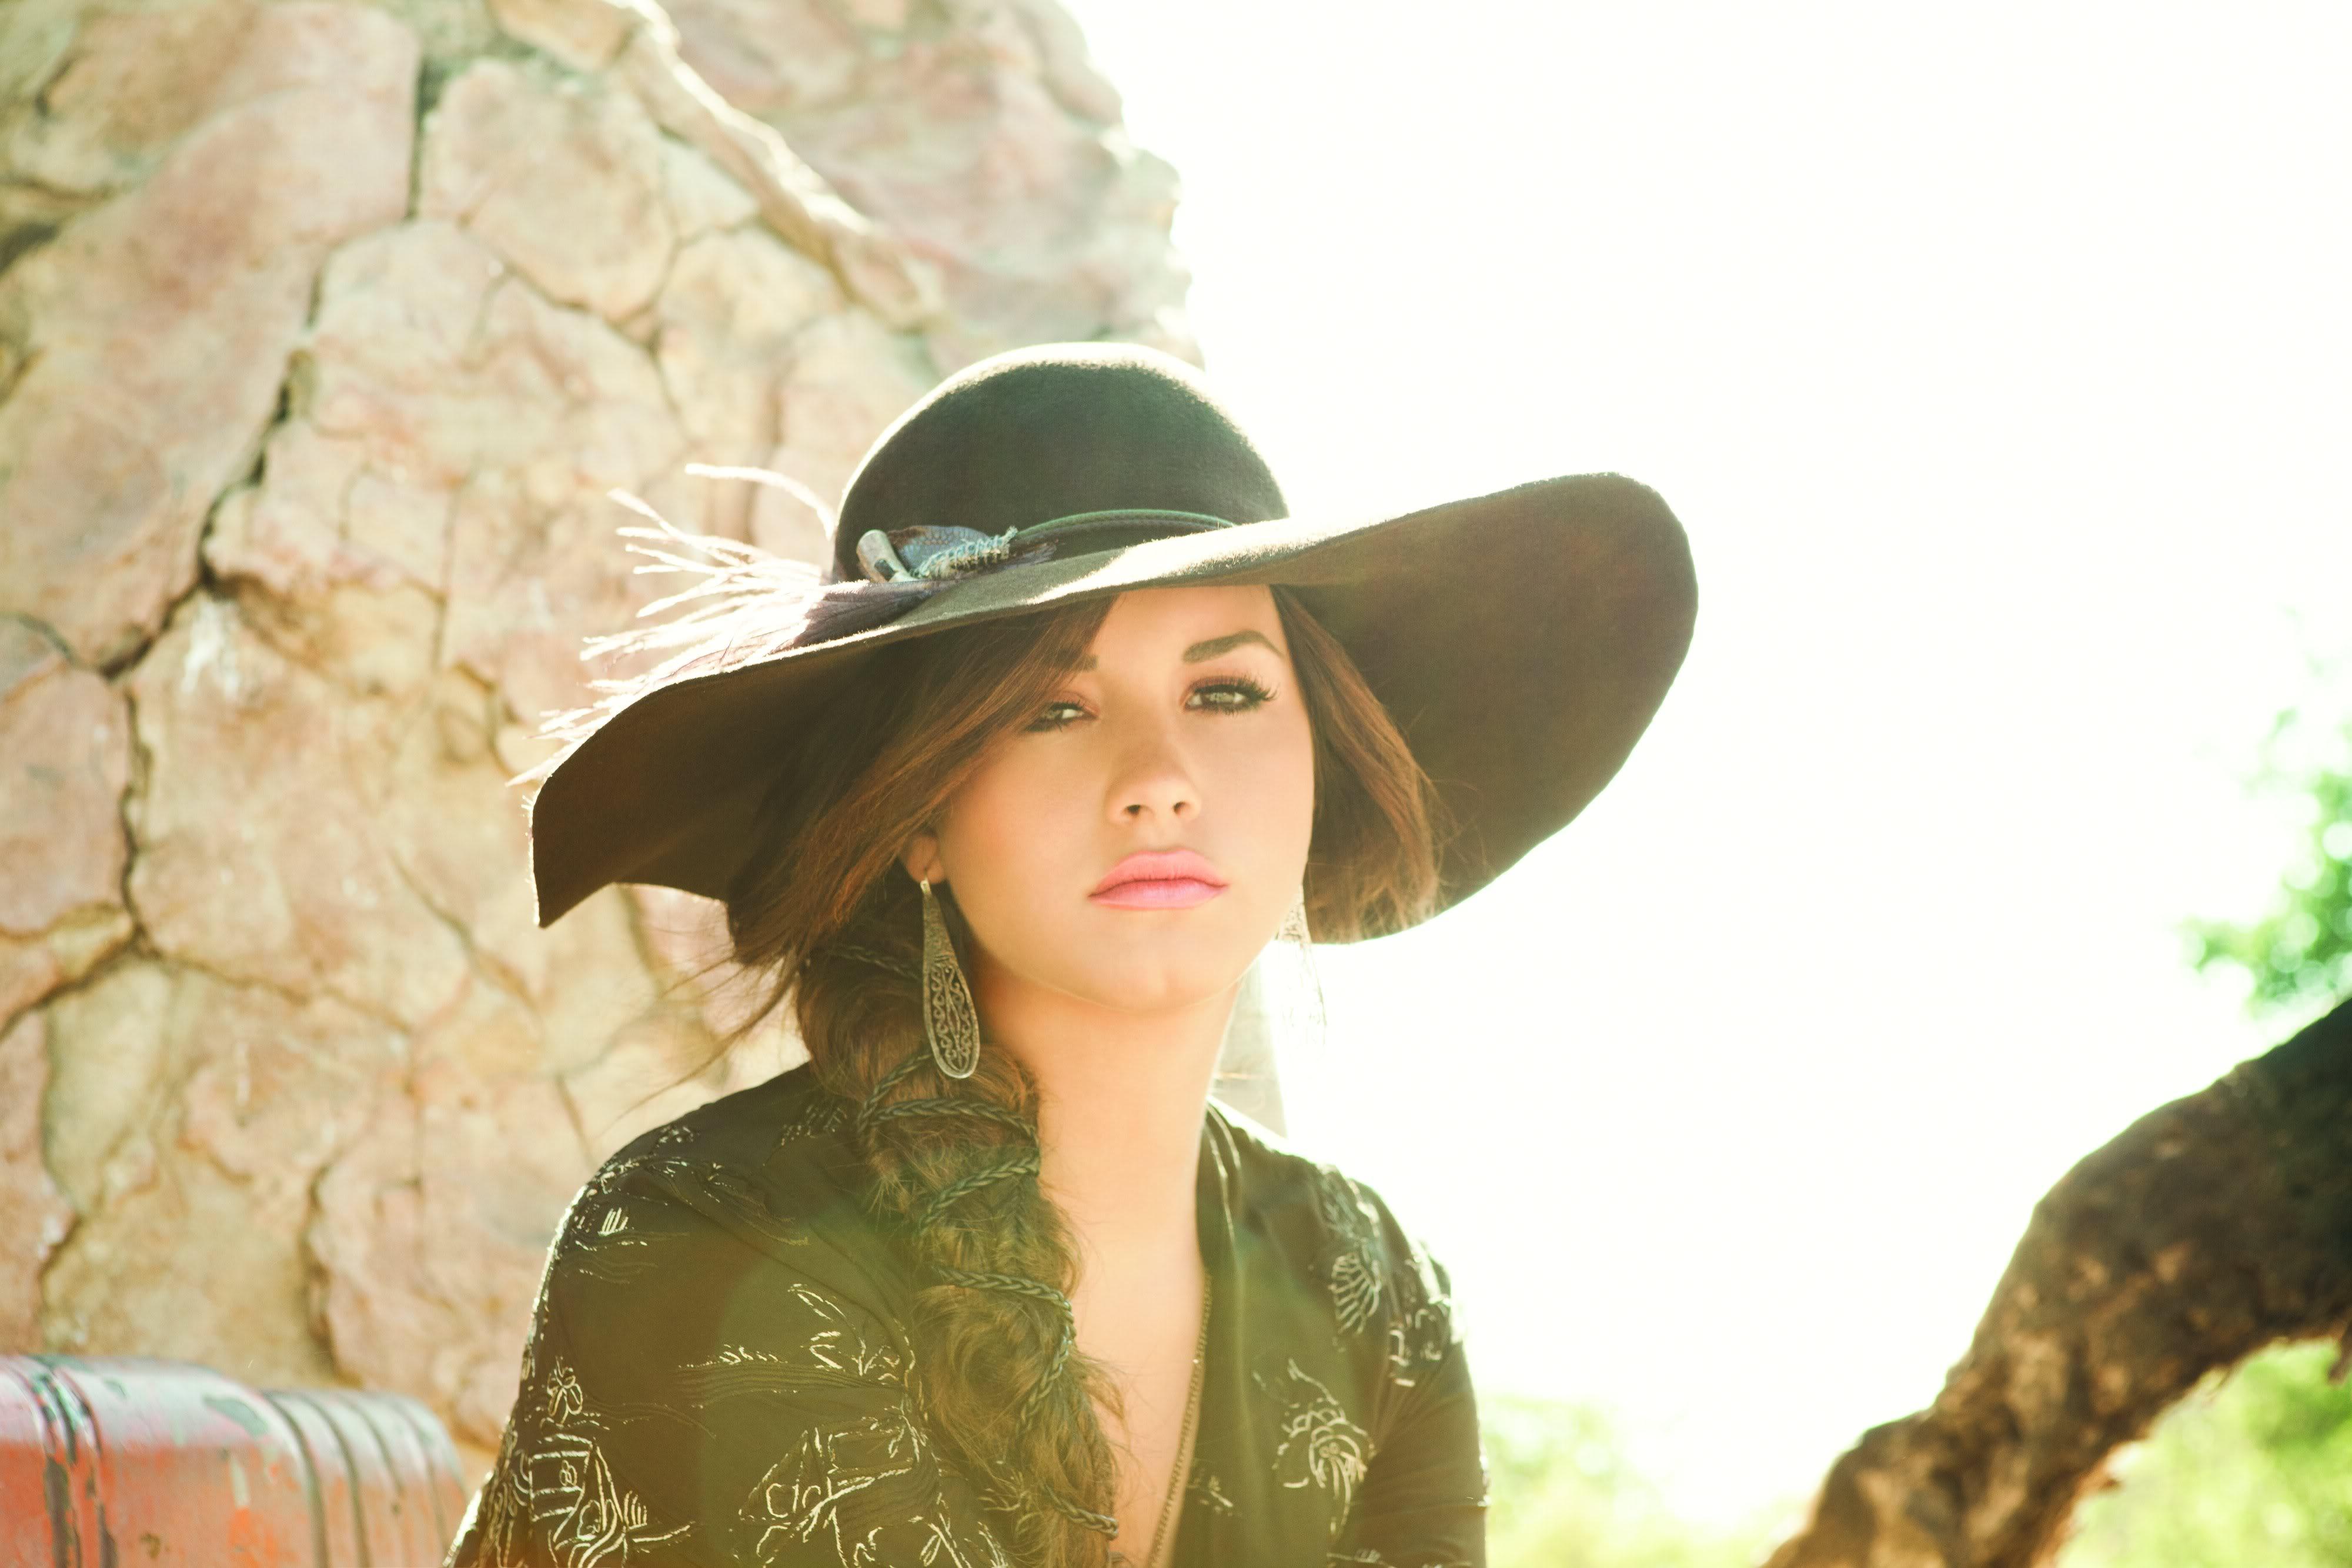 actress singer demi lovato random photo 35861210